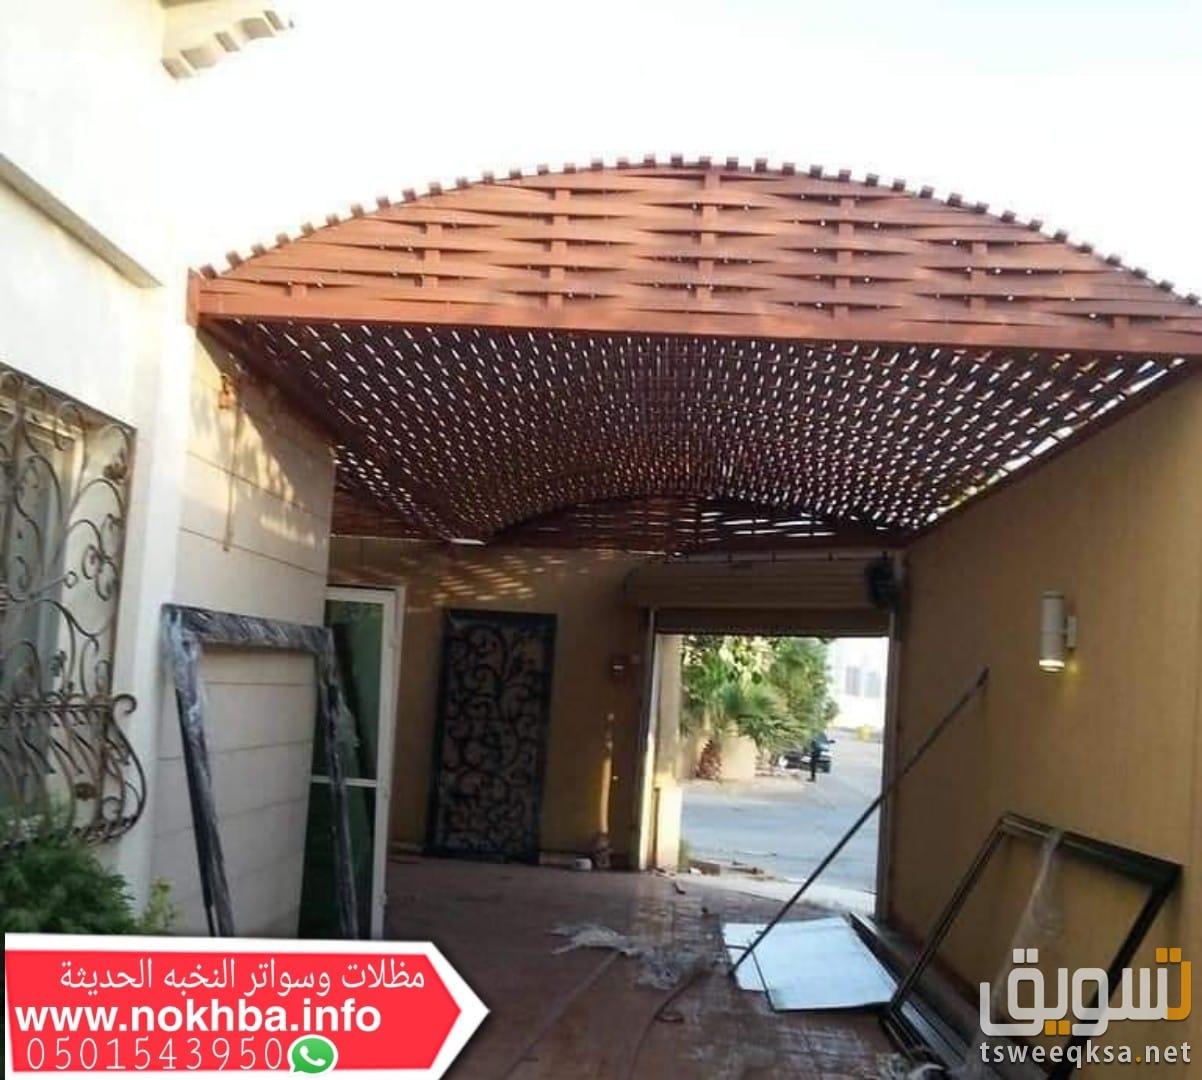 مشاريع مظلات مواقف السيارات  0501543950  تركيب مظلات سيارات  مظلات بي في سي